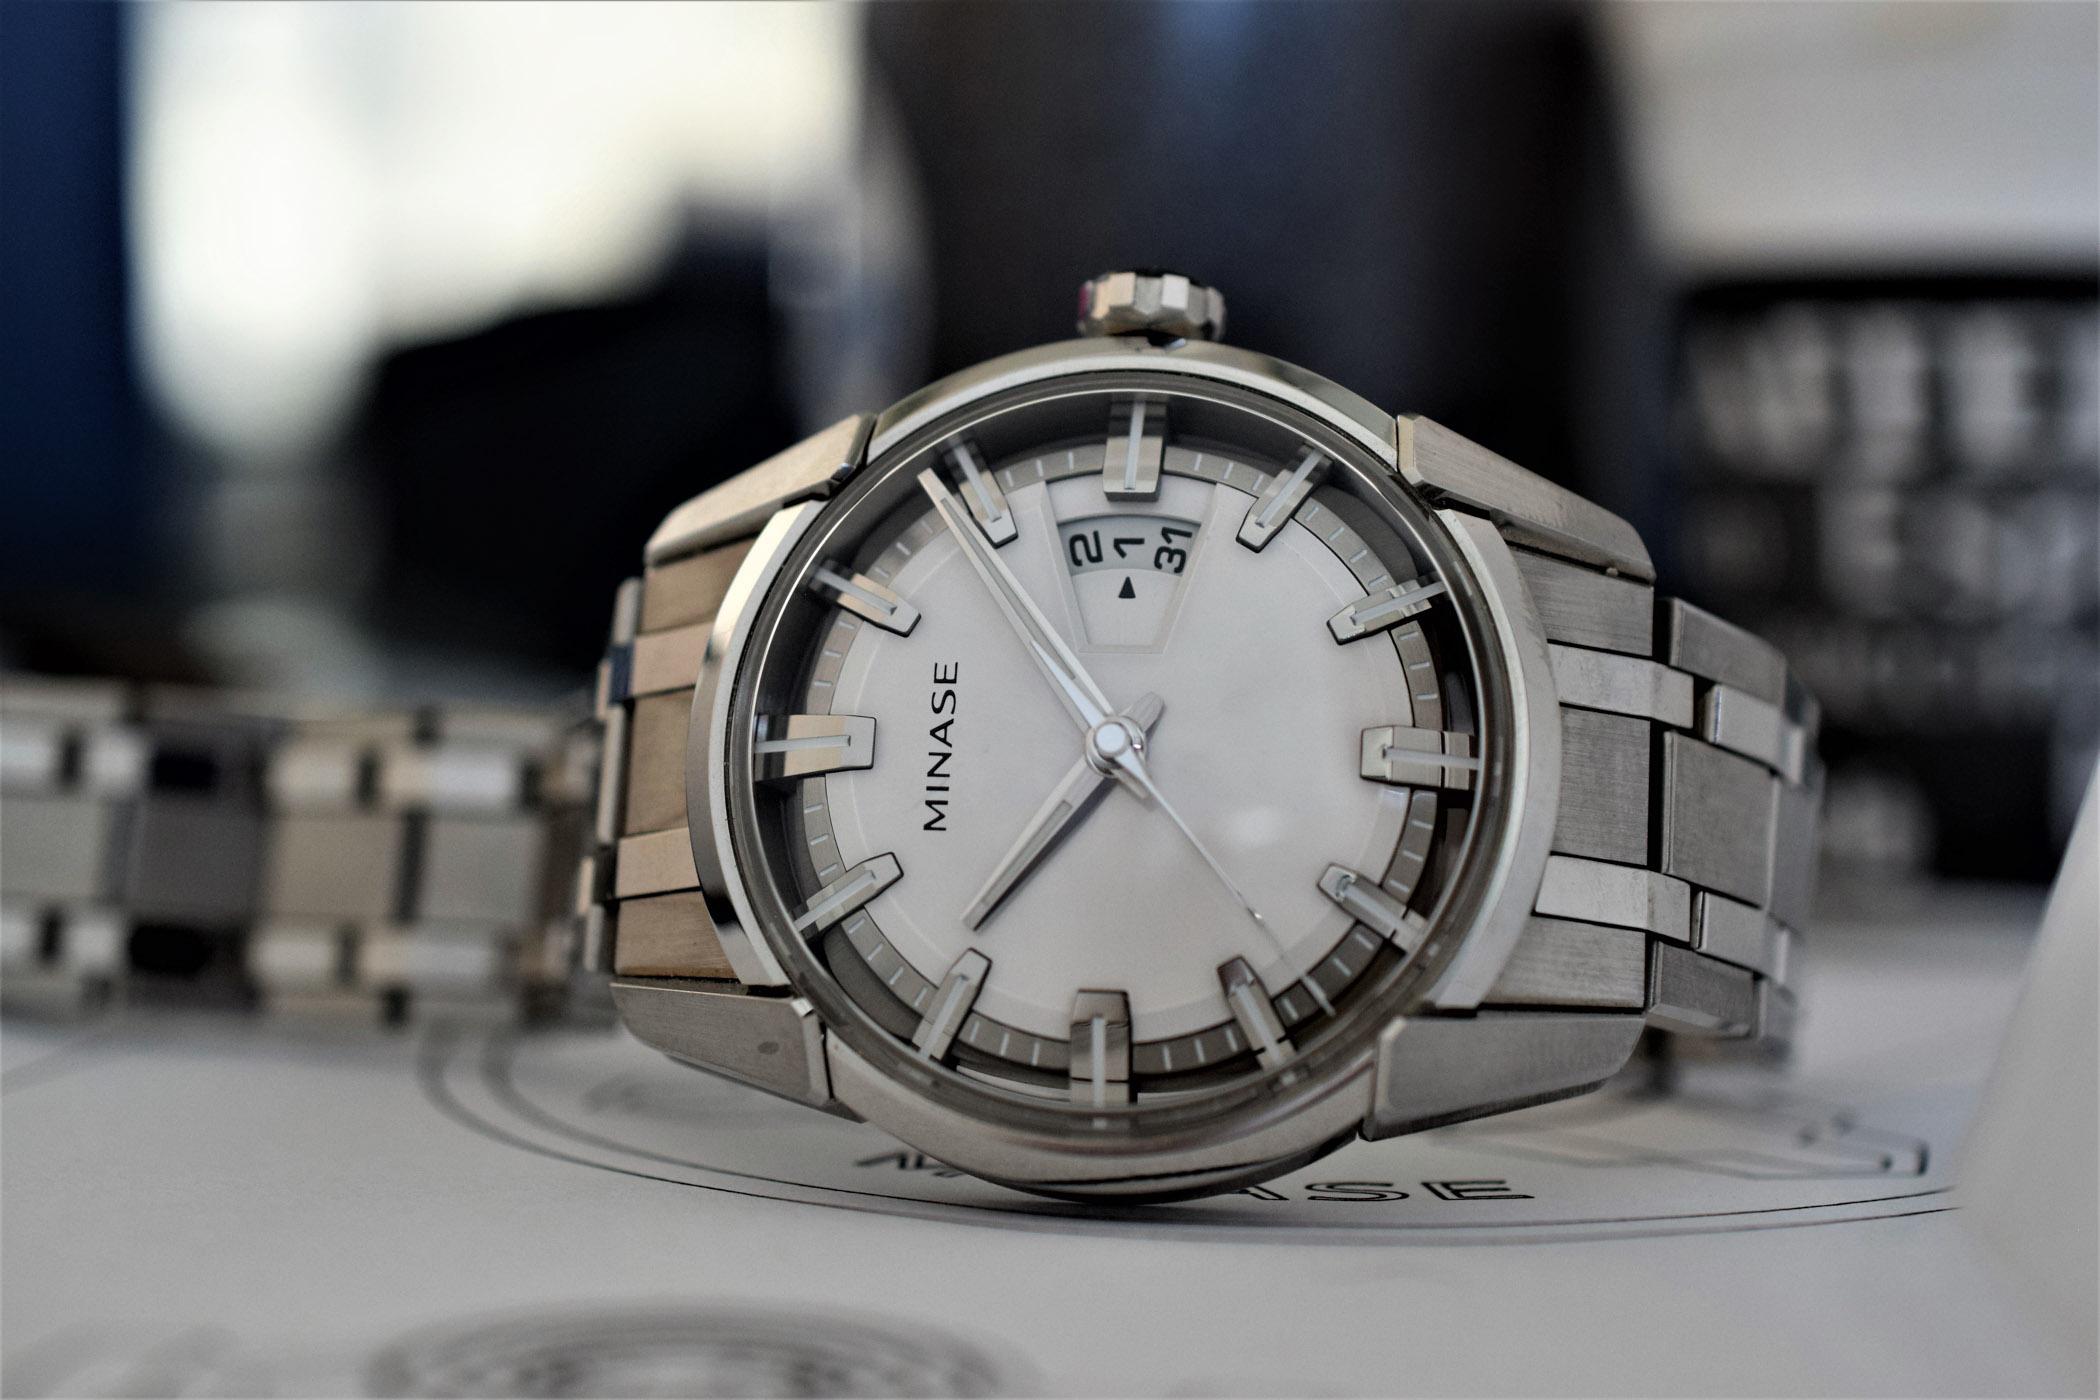 Minase watches - 6